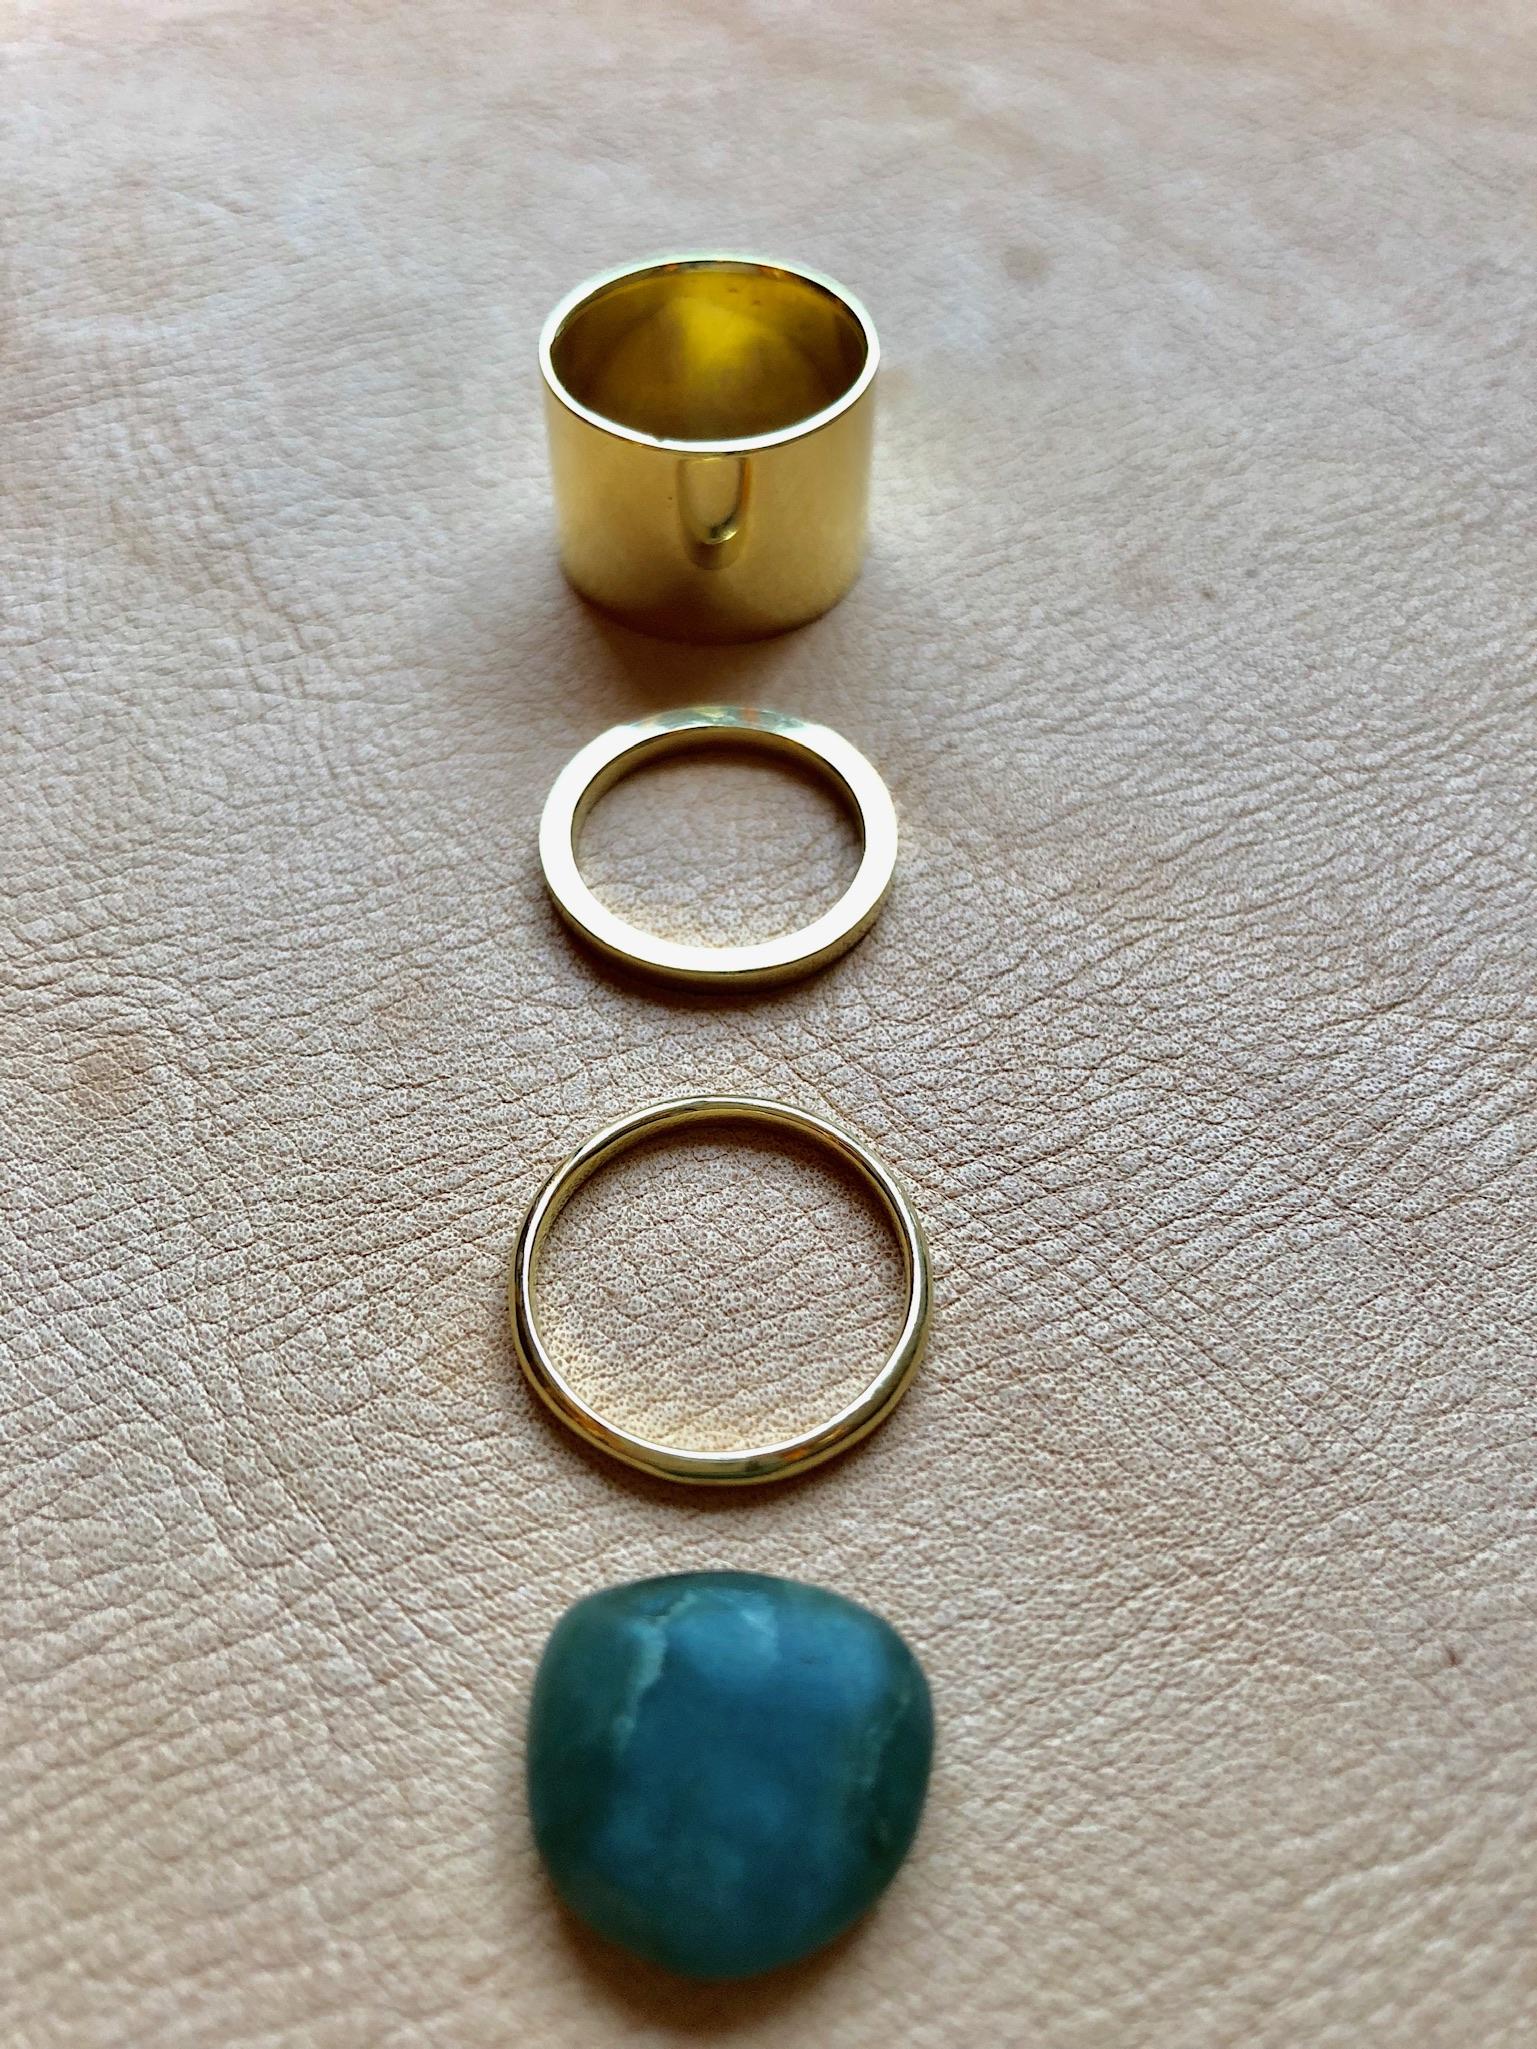 Wayuqui Jewelry イメージ2